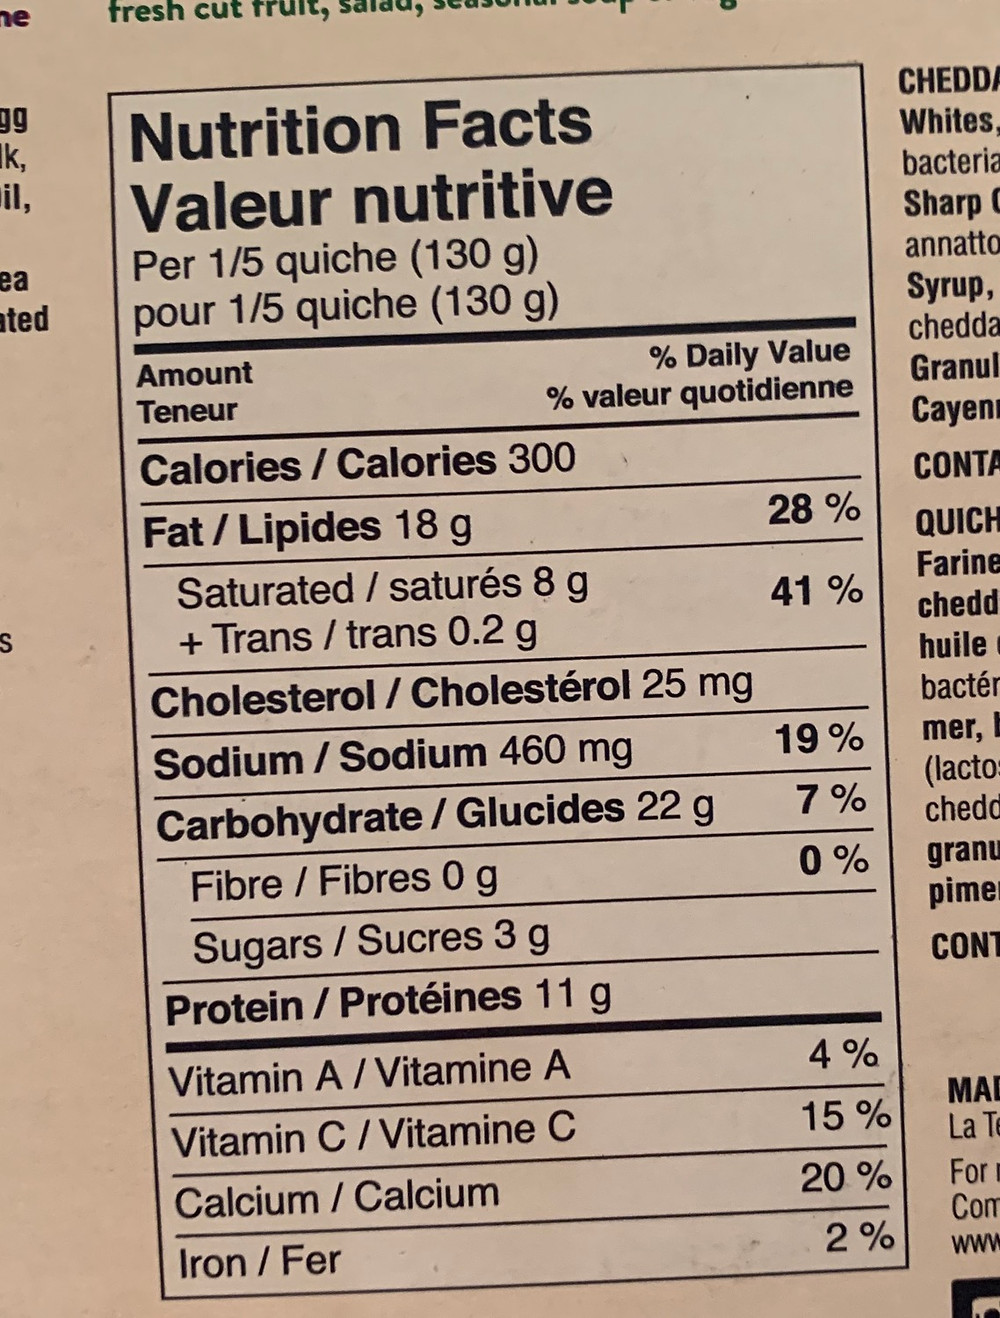 Broccoli & Cheddar Quiche Nutrition